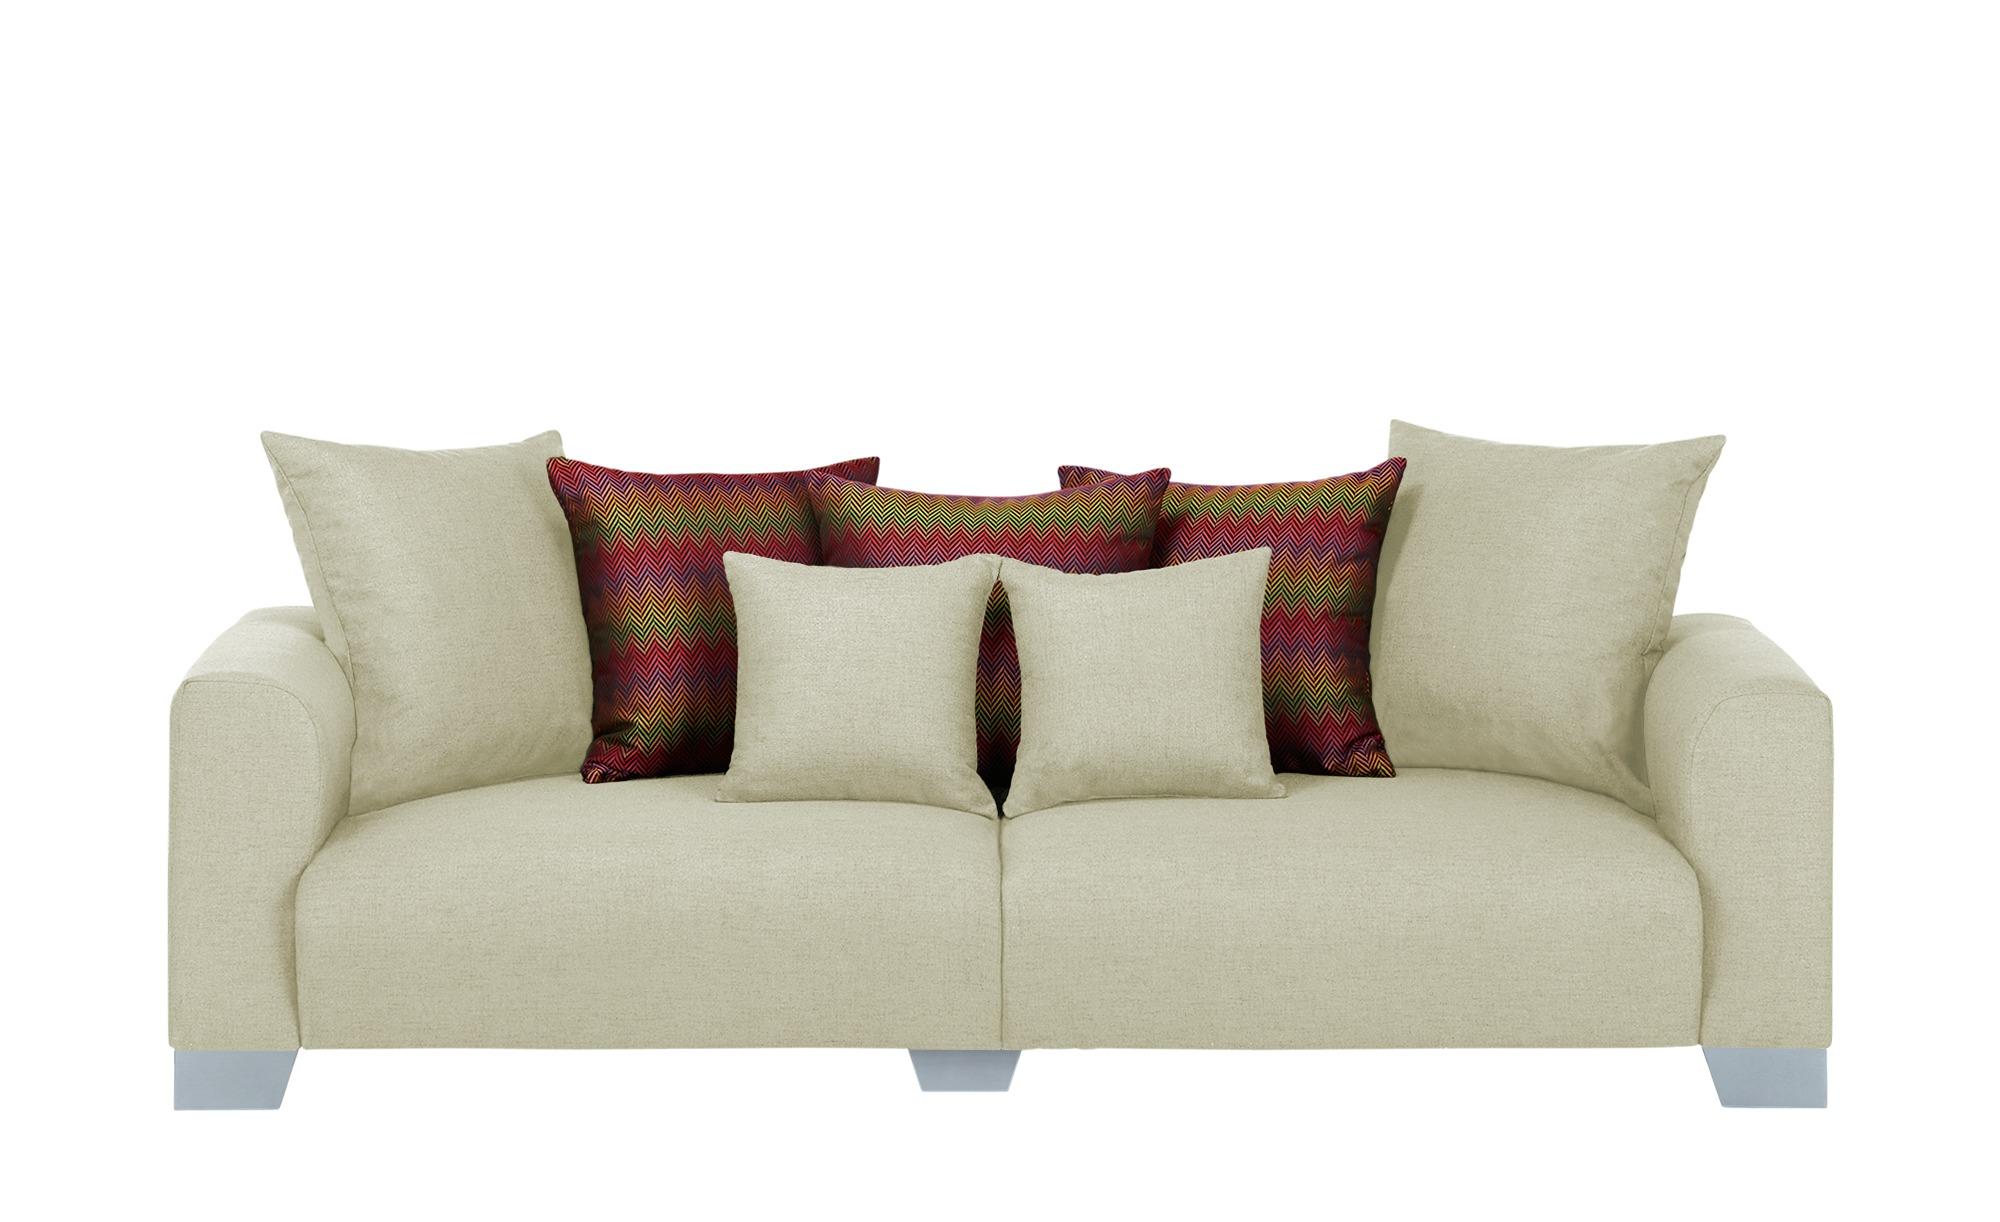 smart Big Sofa  Tonja ¦ beige ¦ Maße (cm): B: 244 H: 68 T: 107 Polstermöbel > Sofas > Big-Sofas - Höffner